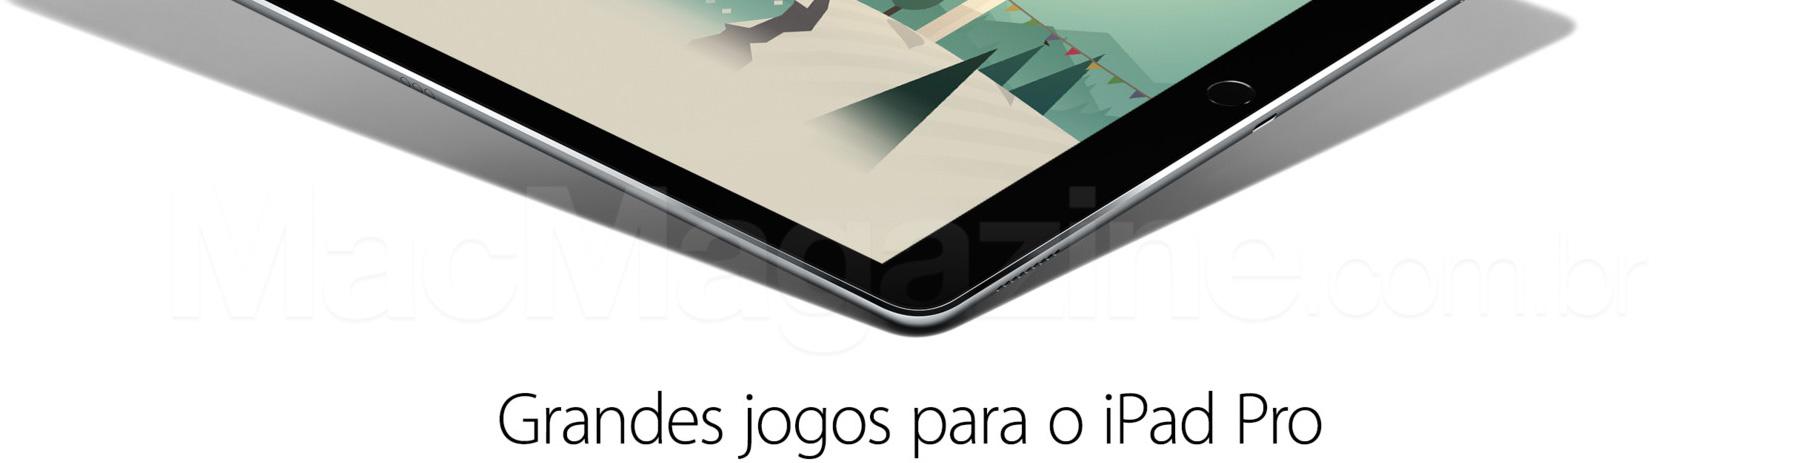 Grandes jogos para o iPad Pro